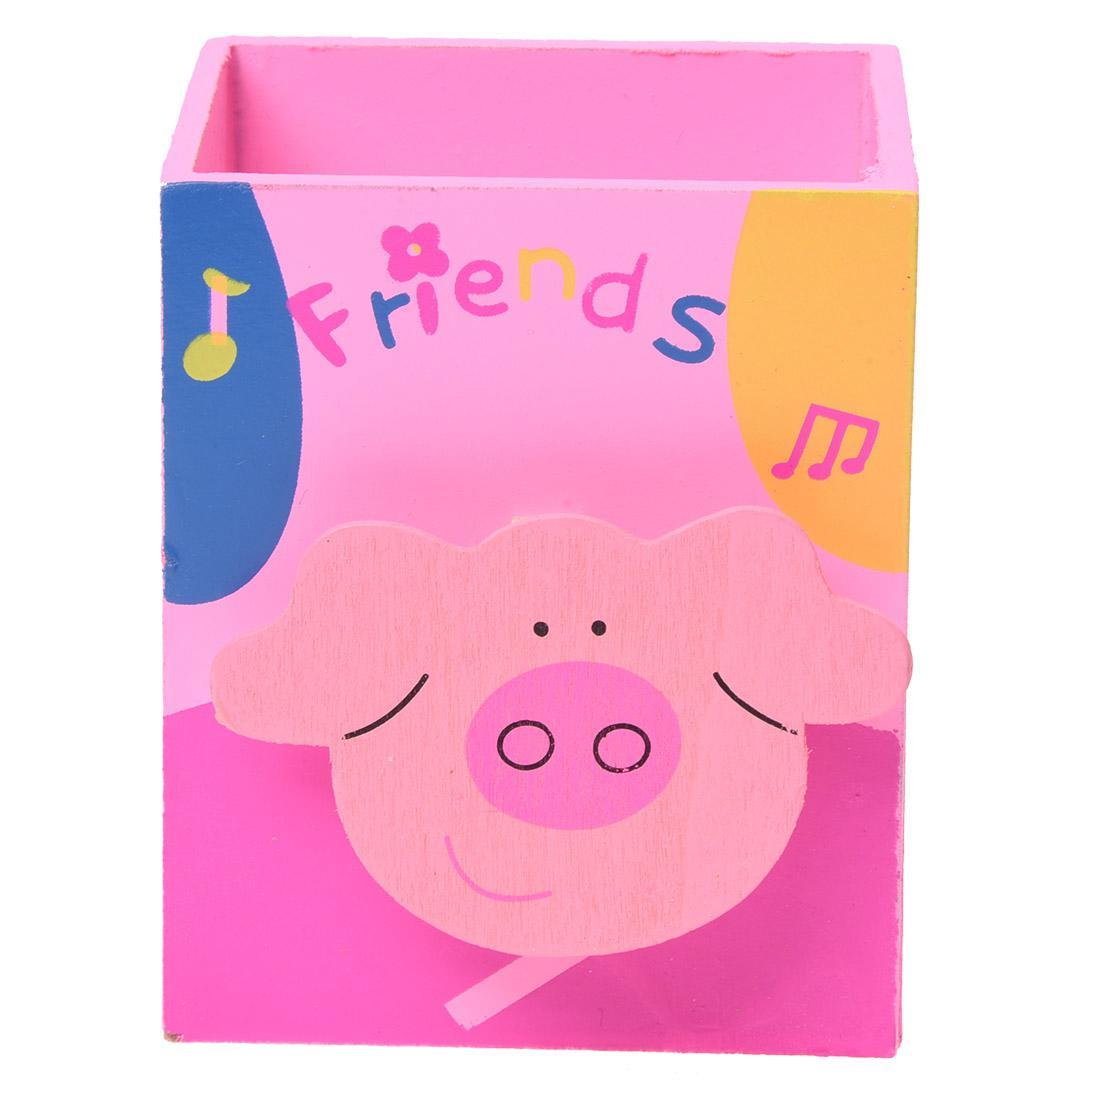 Cute Cartoon Pink Pig Memo Clip Wood Desk Pen Pencil Organiser Cup Holder